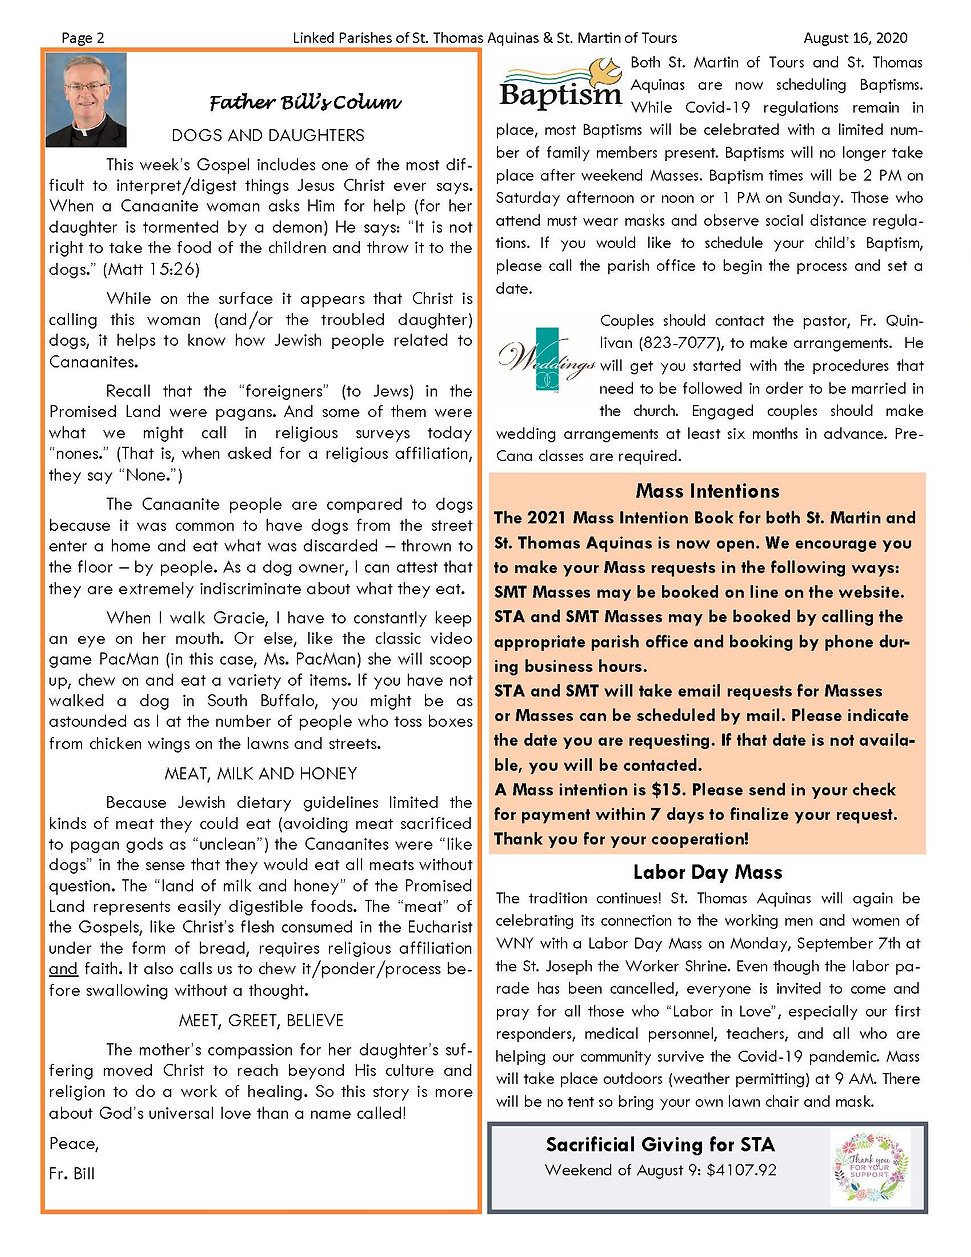 August 16, 2020 bulletin_Page_2.jpg